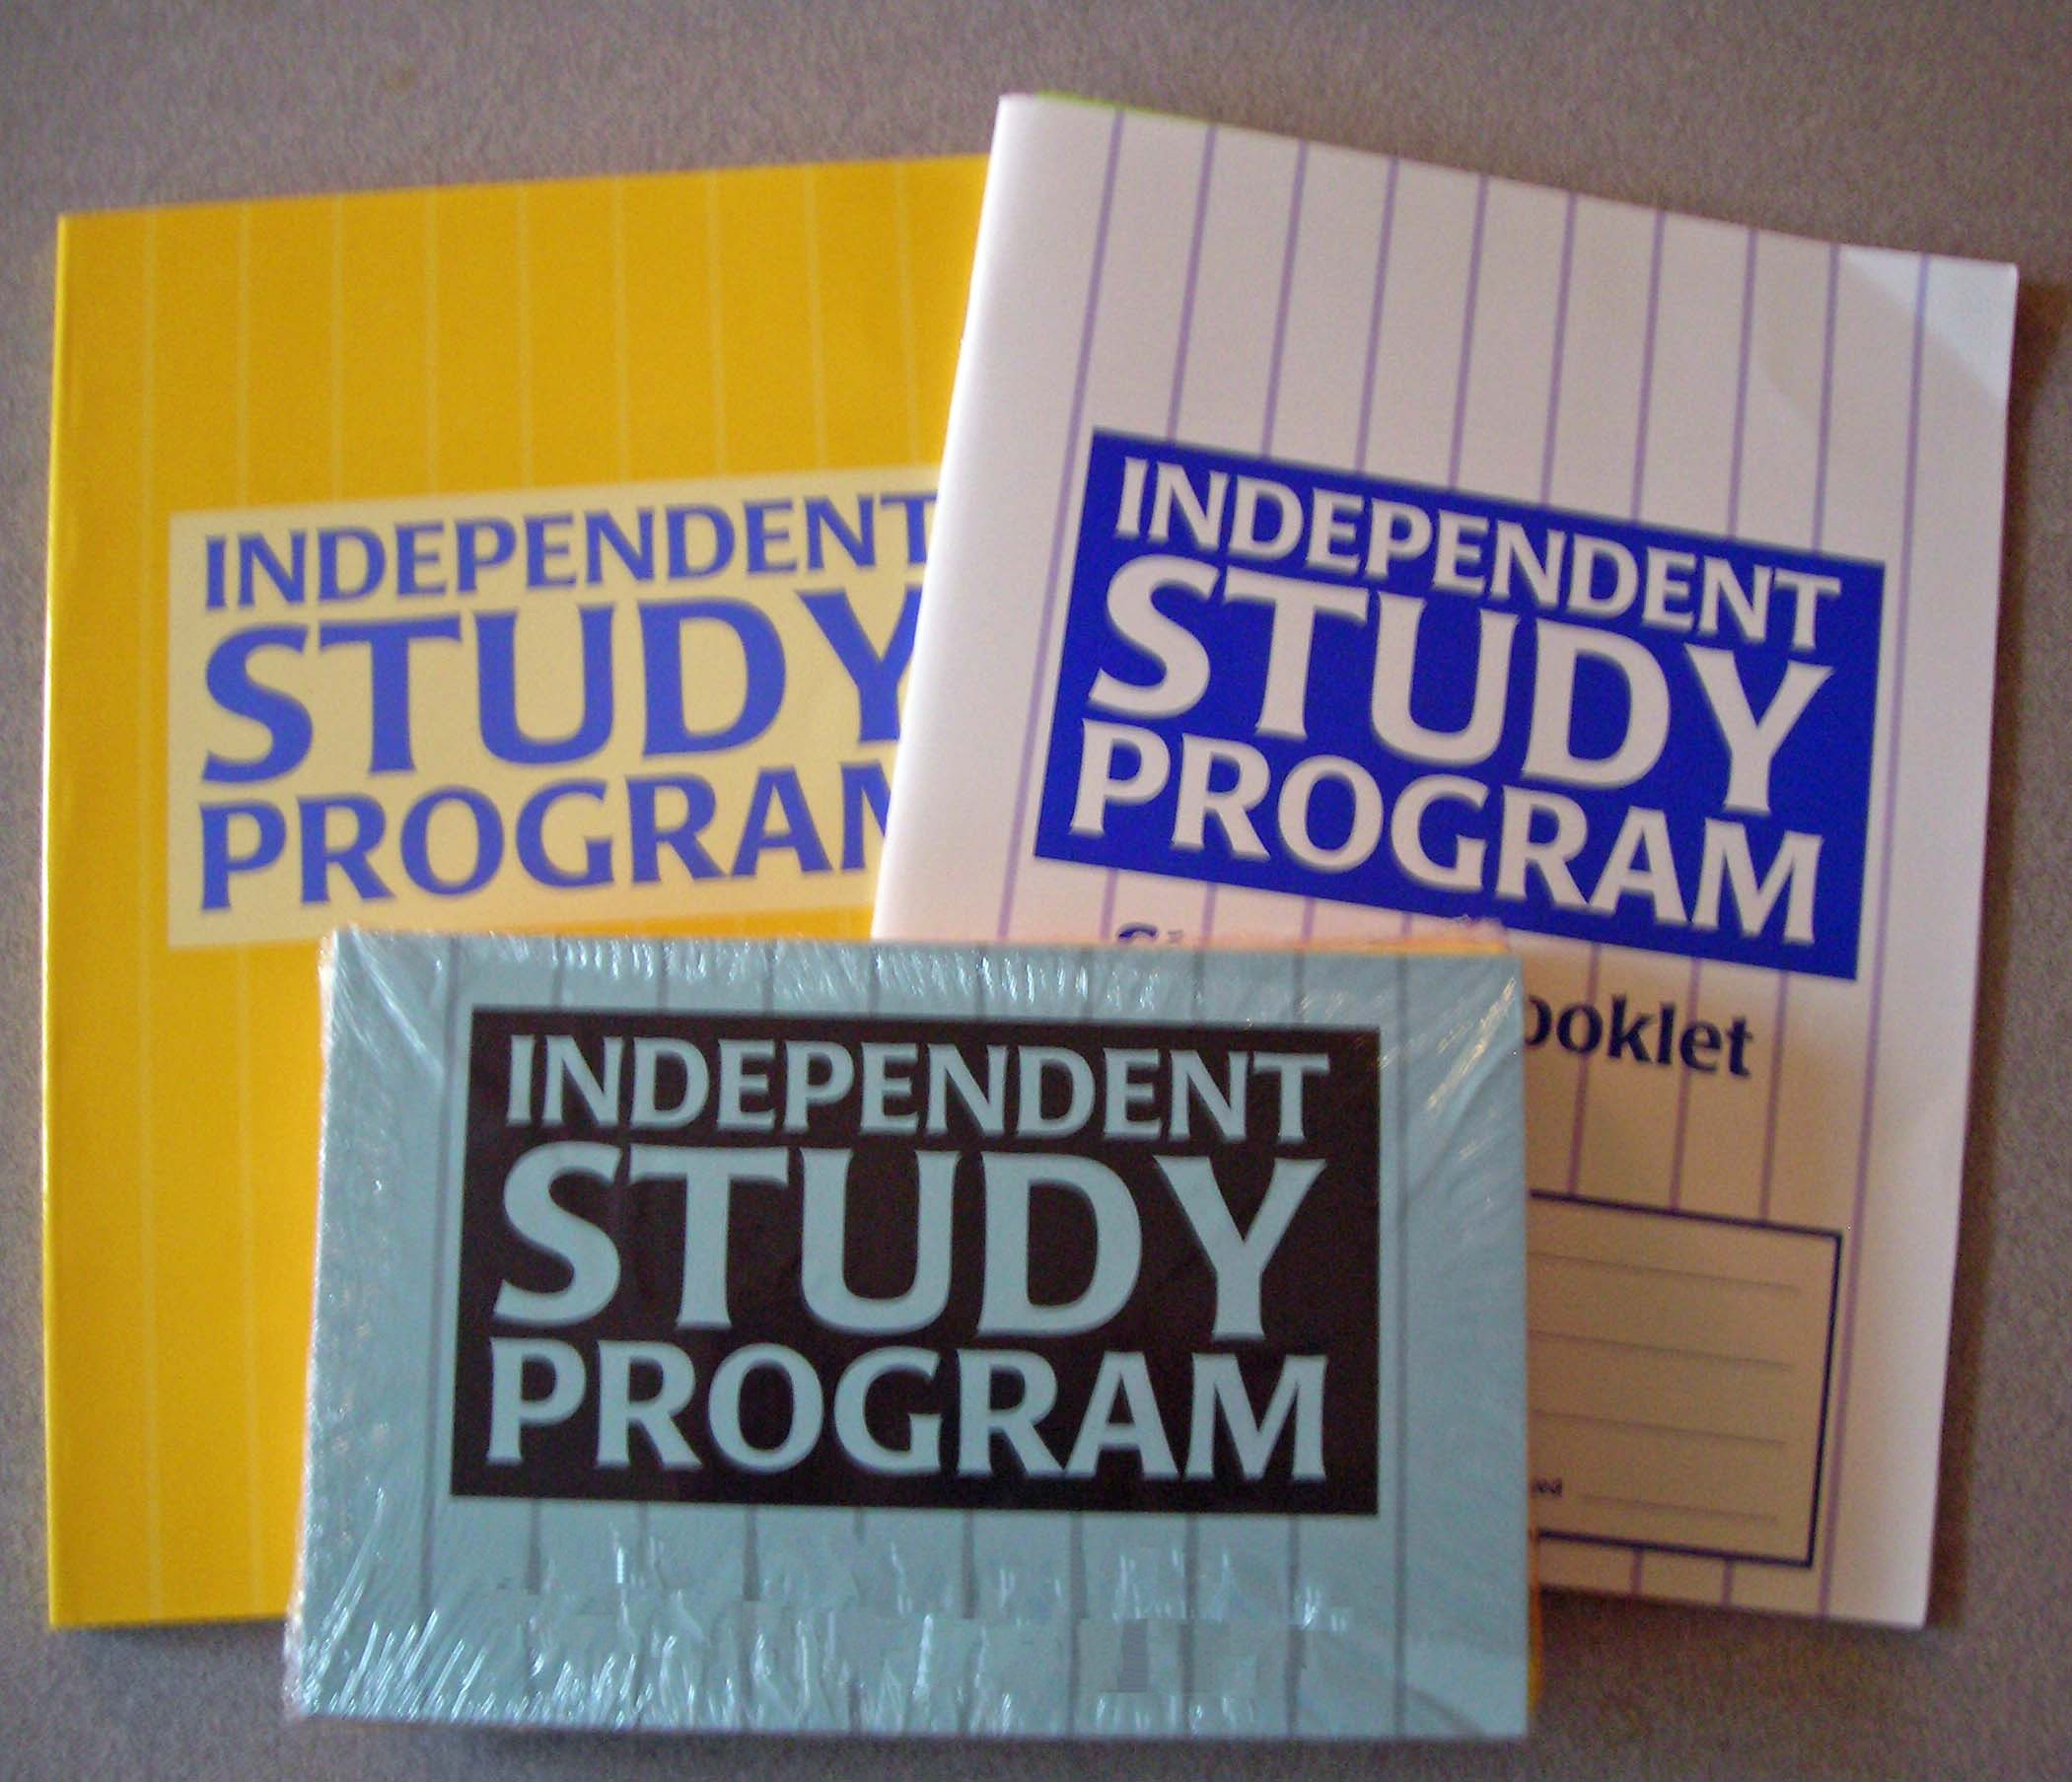 5Independent Study